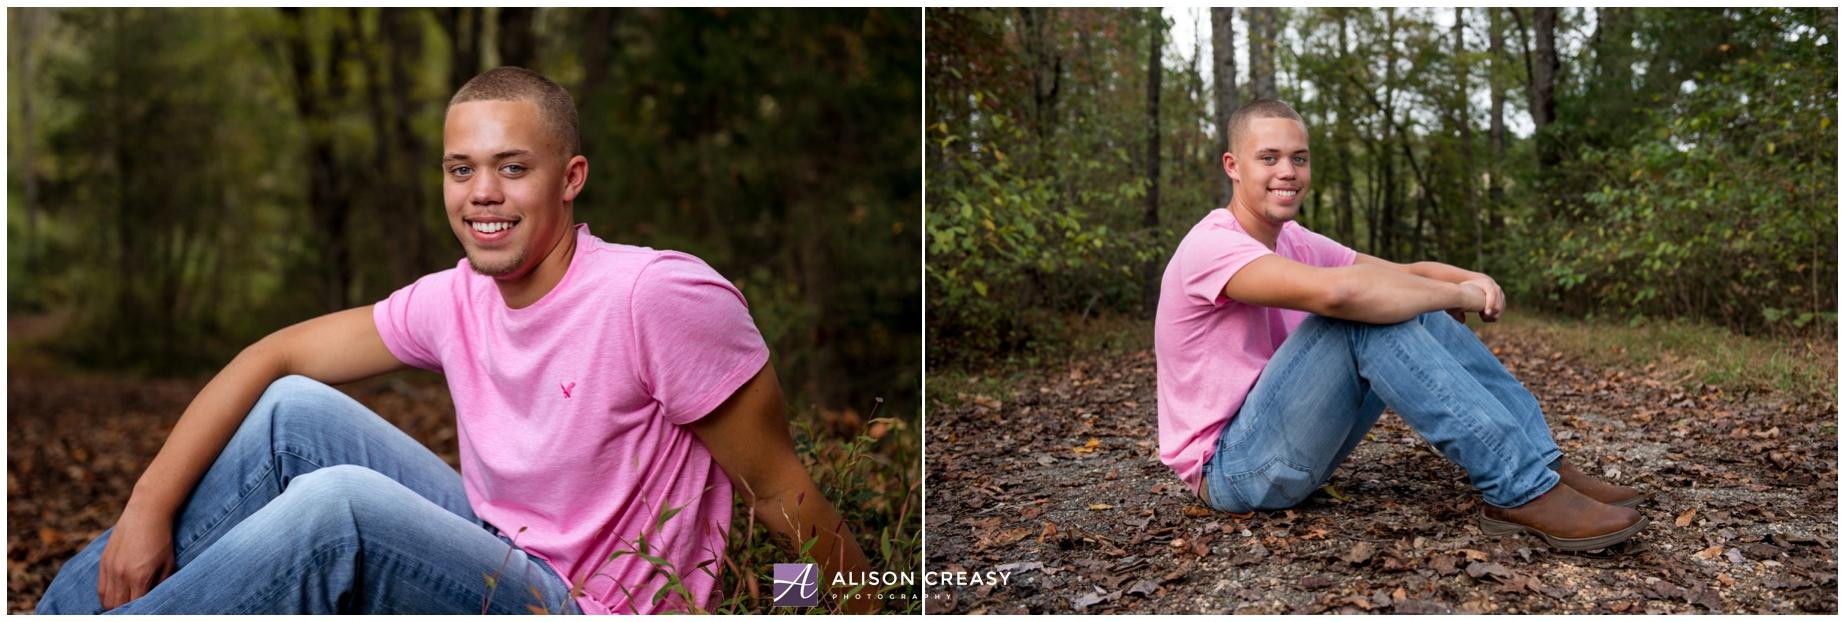 Alison-Creasy-Photography-Lynchburg-VA-Photographer_0922.jpg